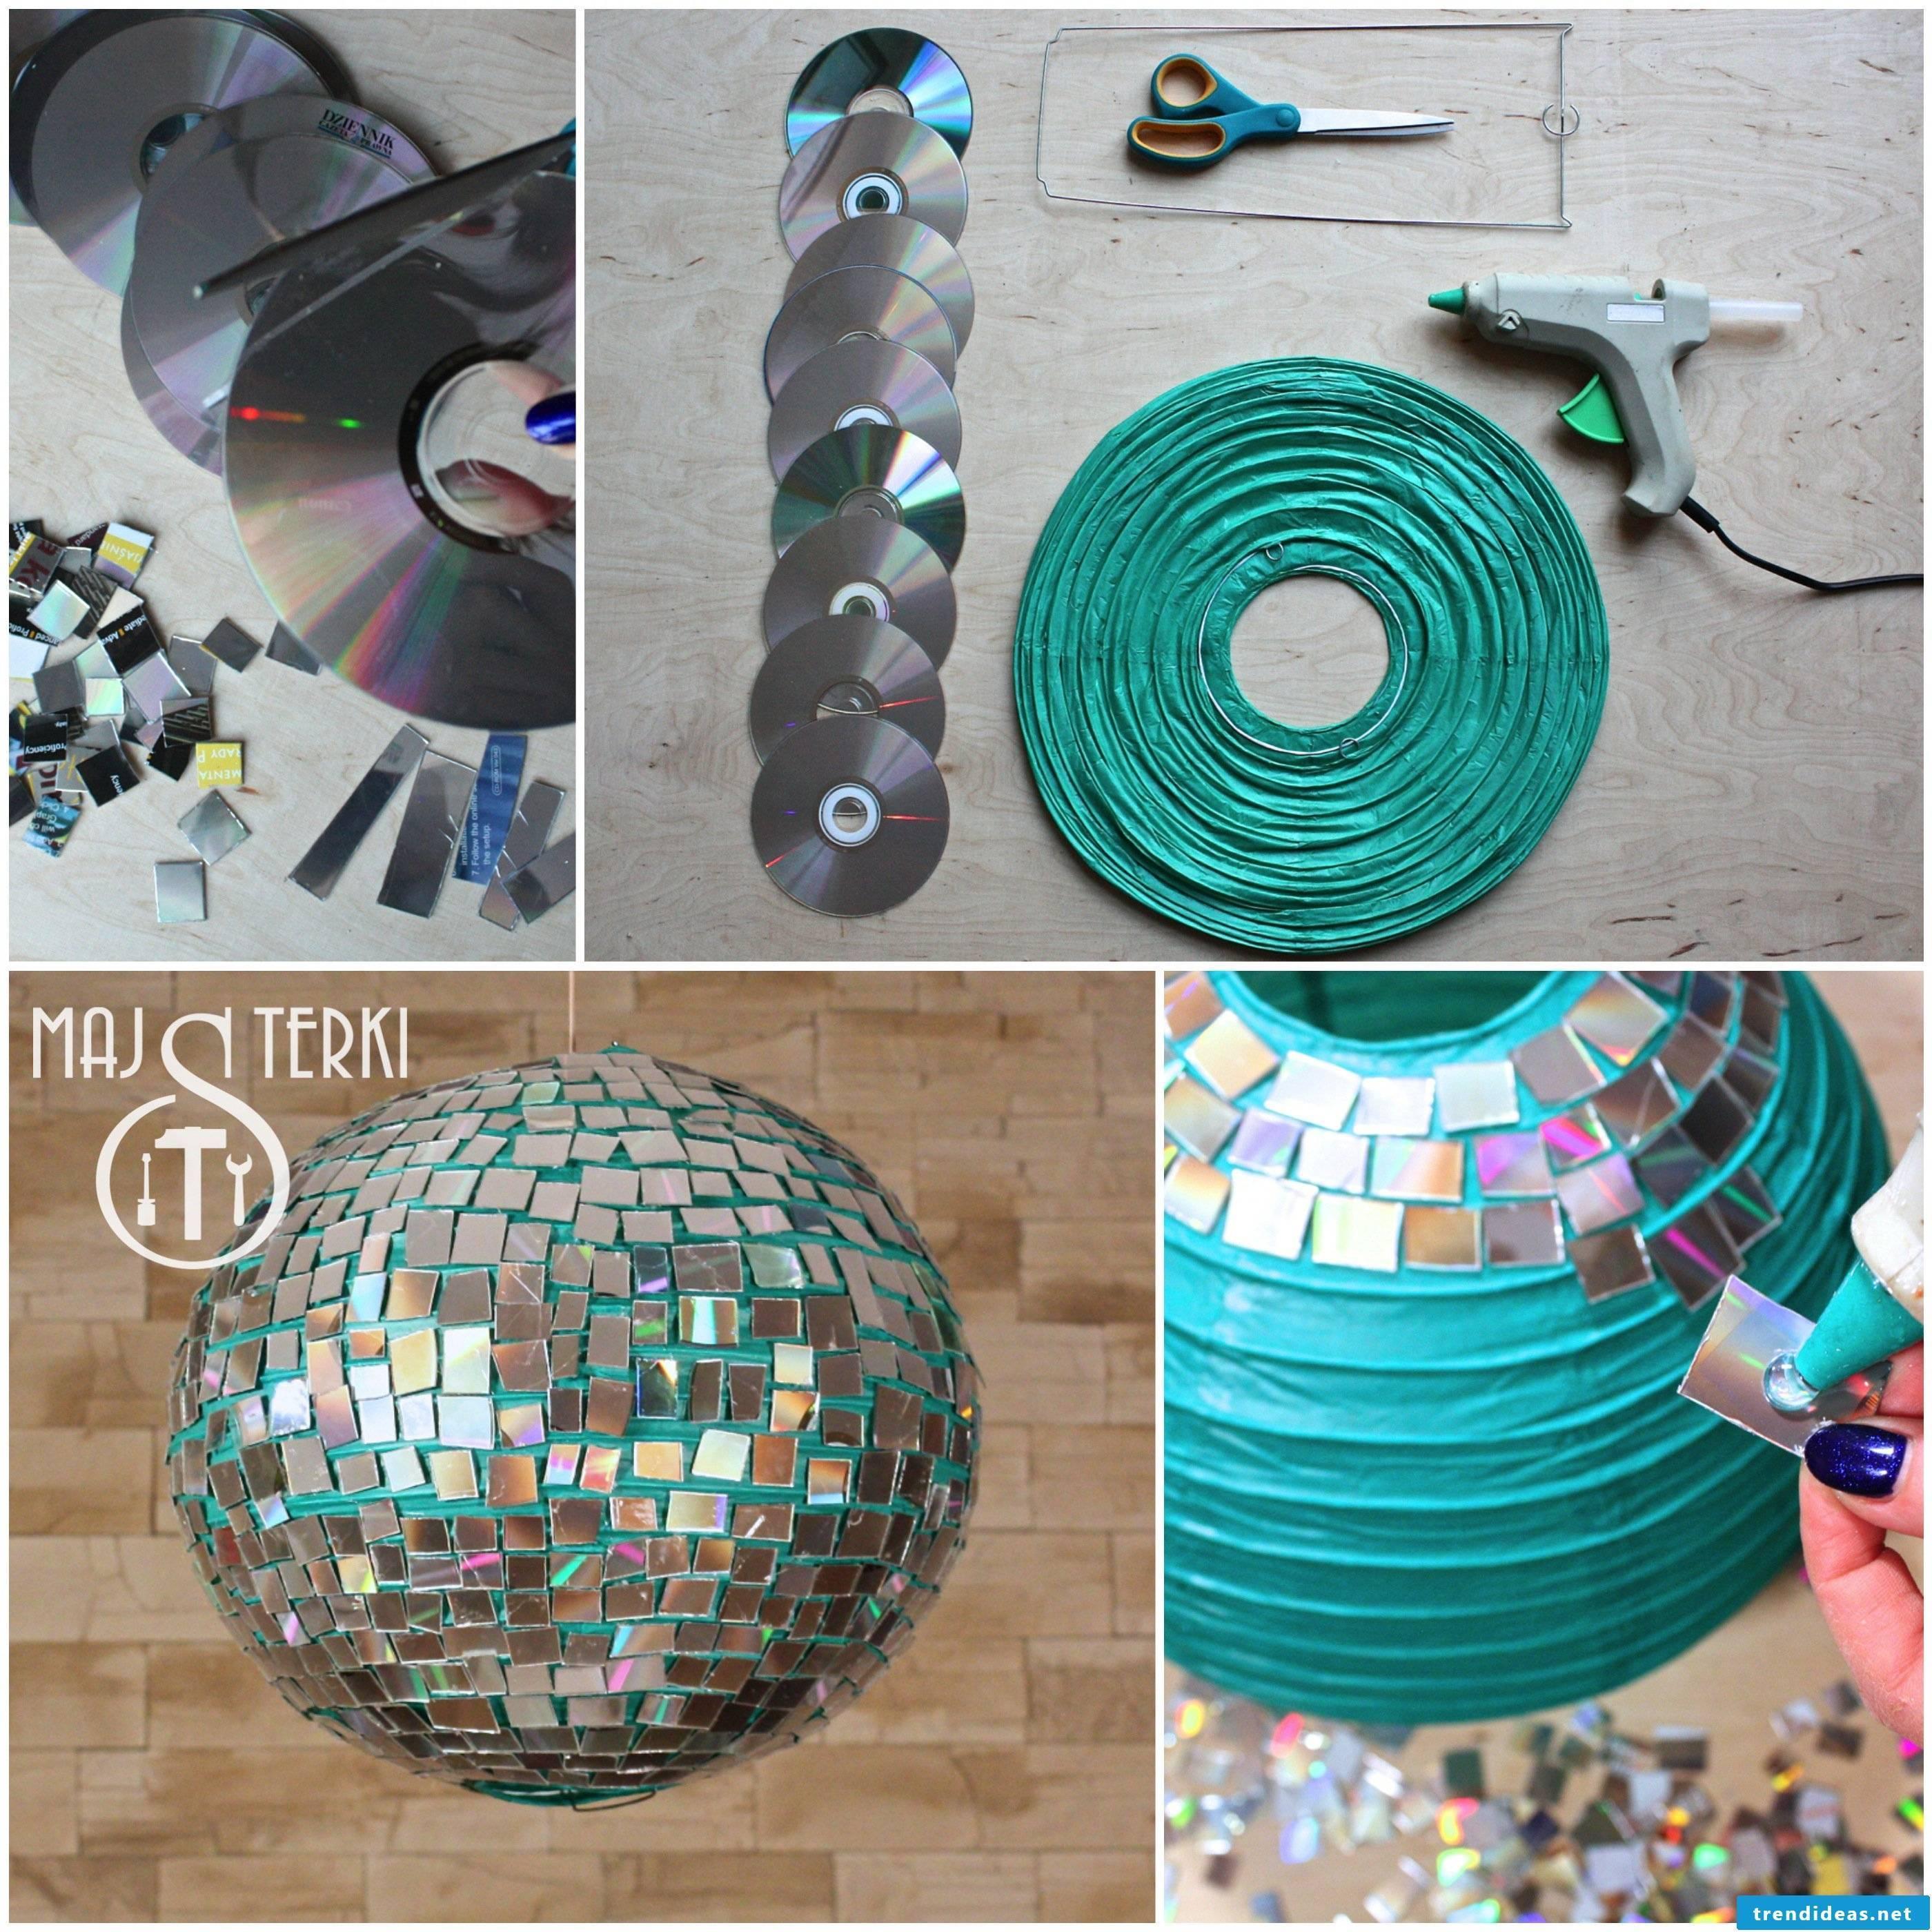 Make lanterns from unused CDs